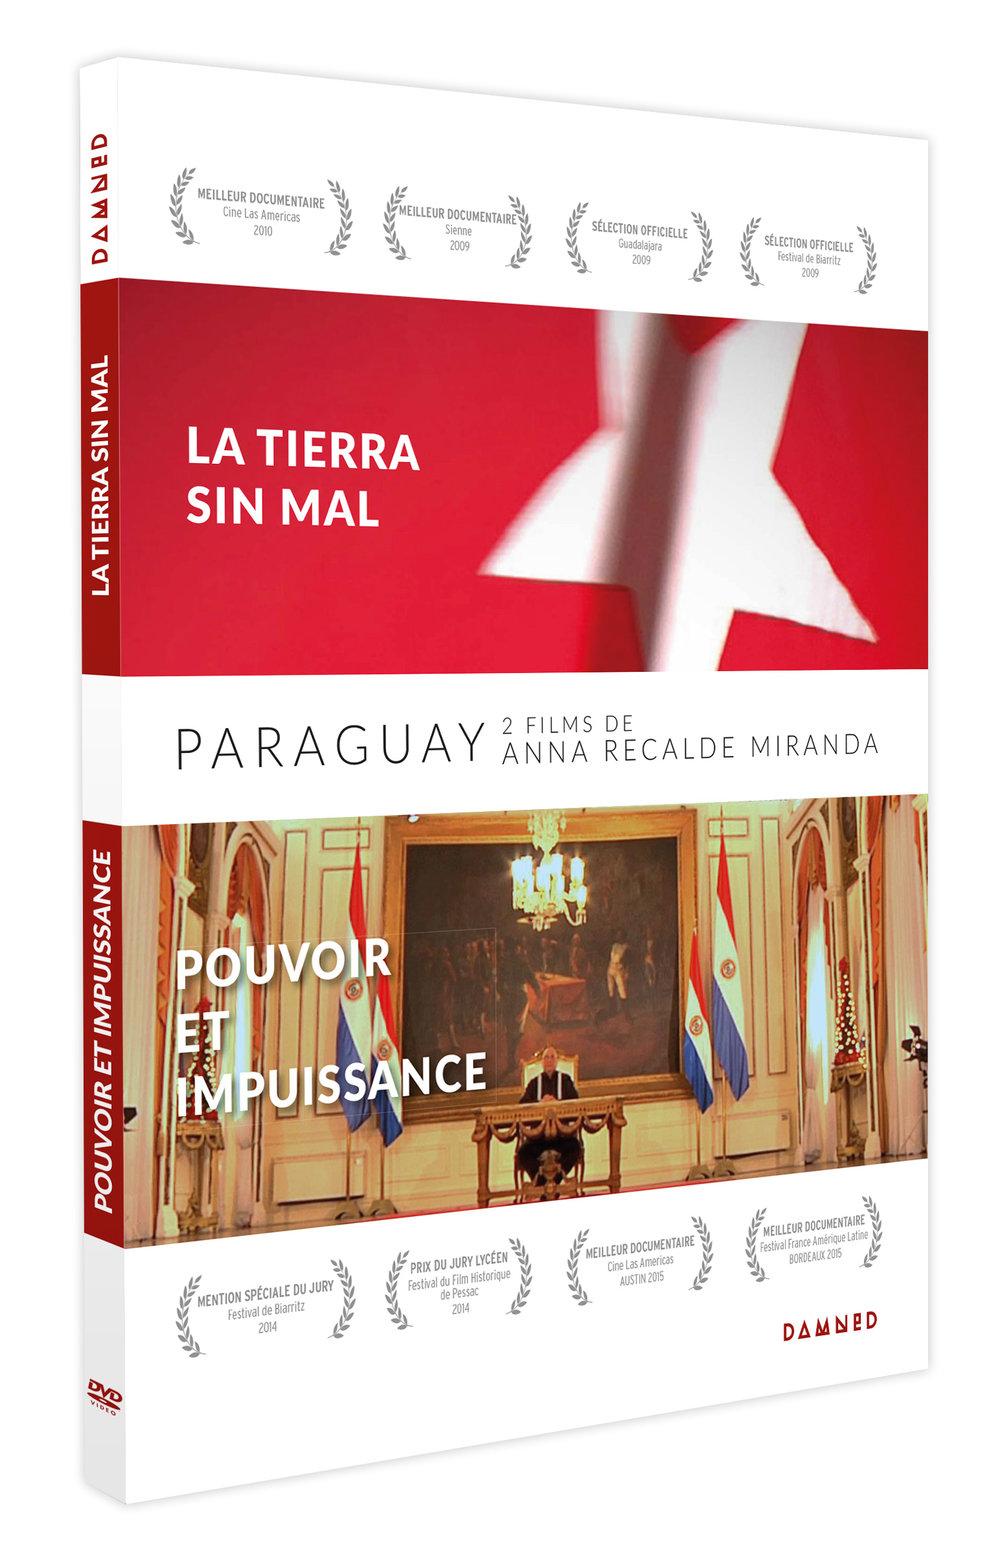 icone_dvd_paraguay.jpg